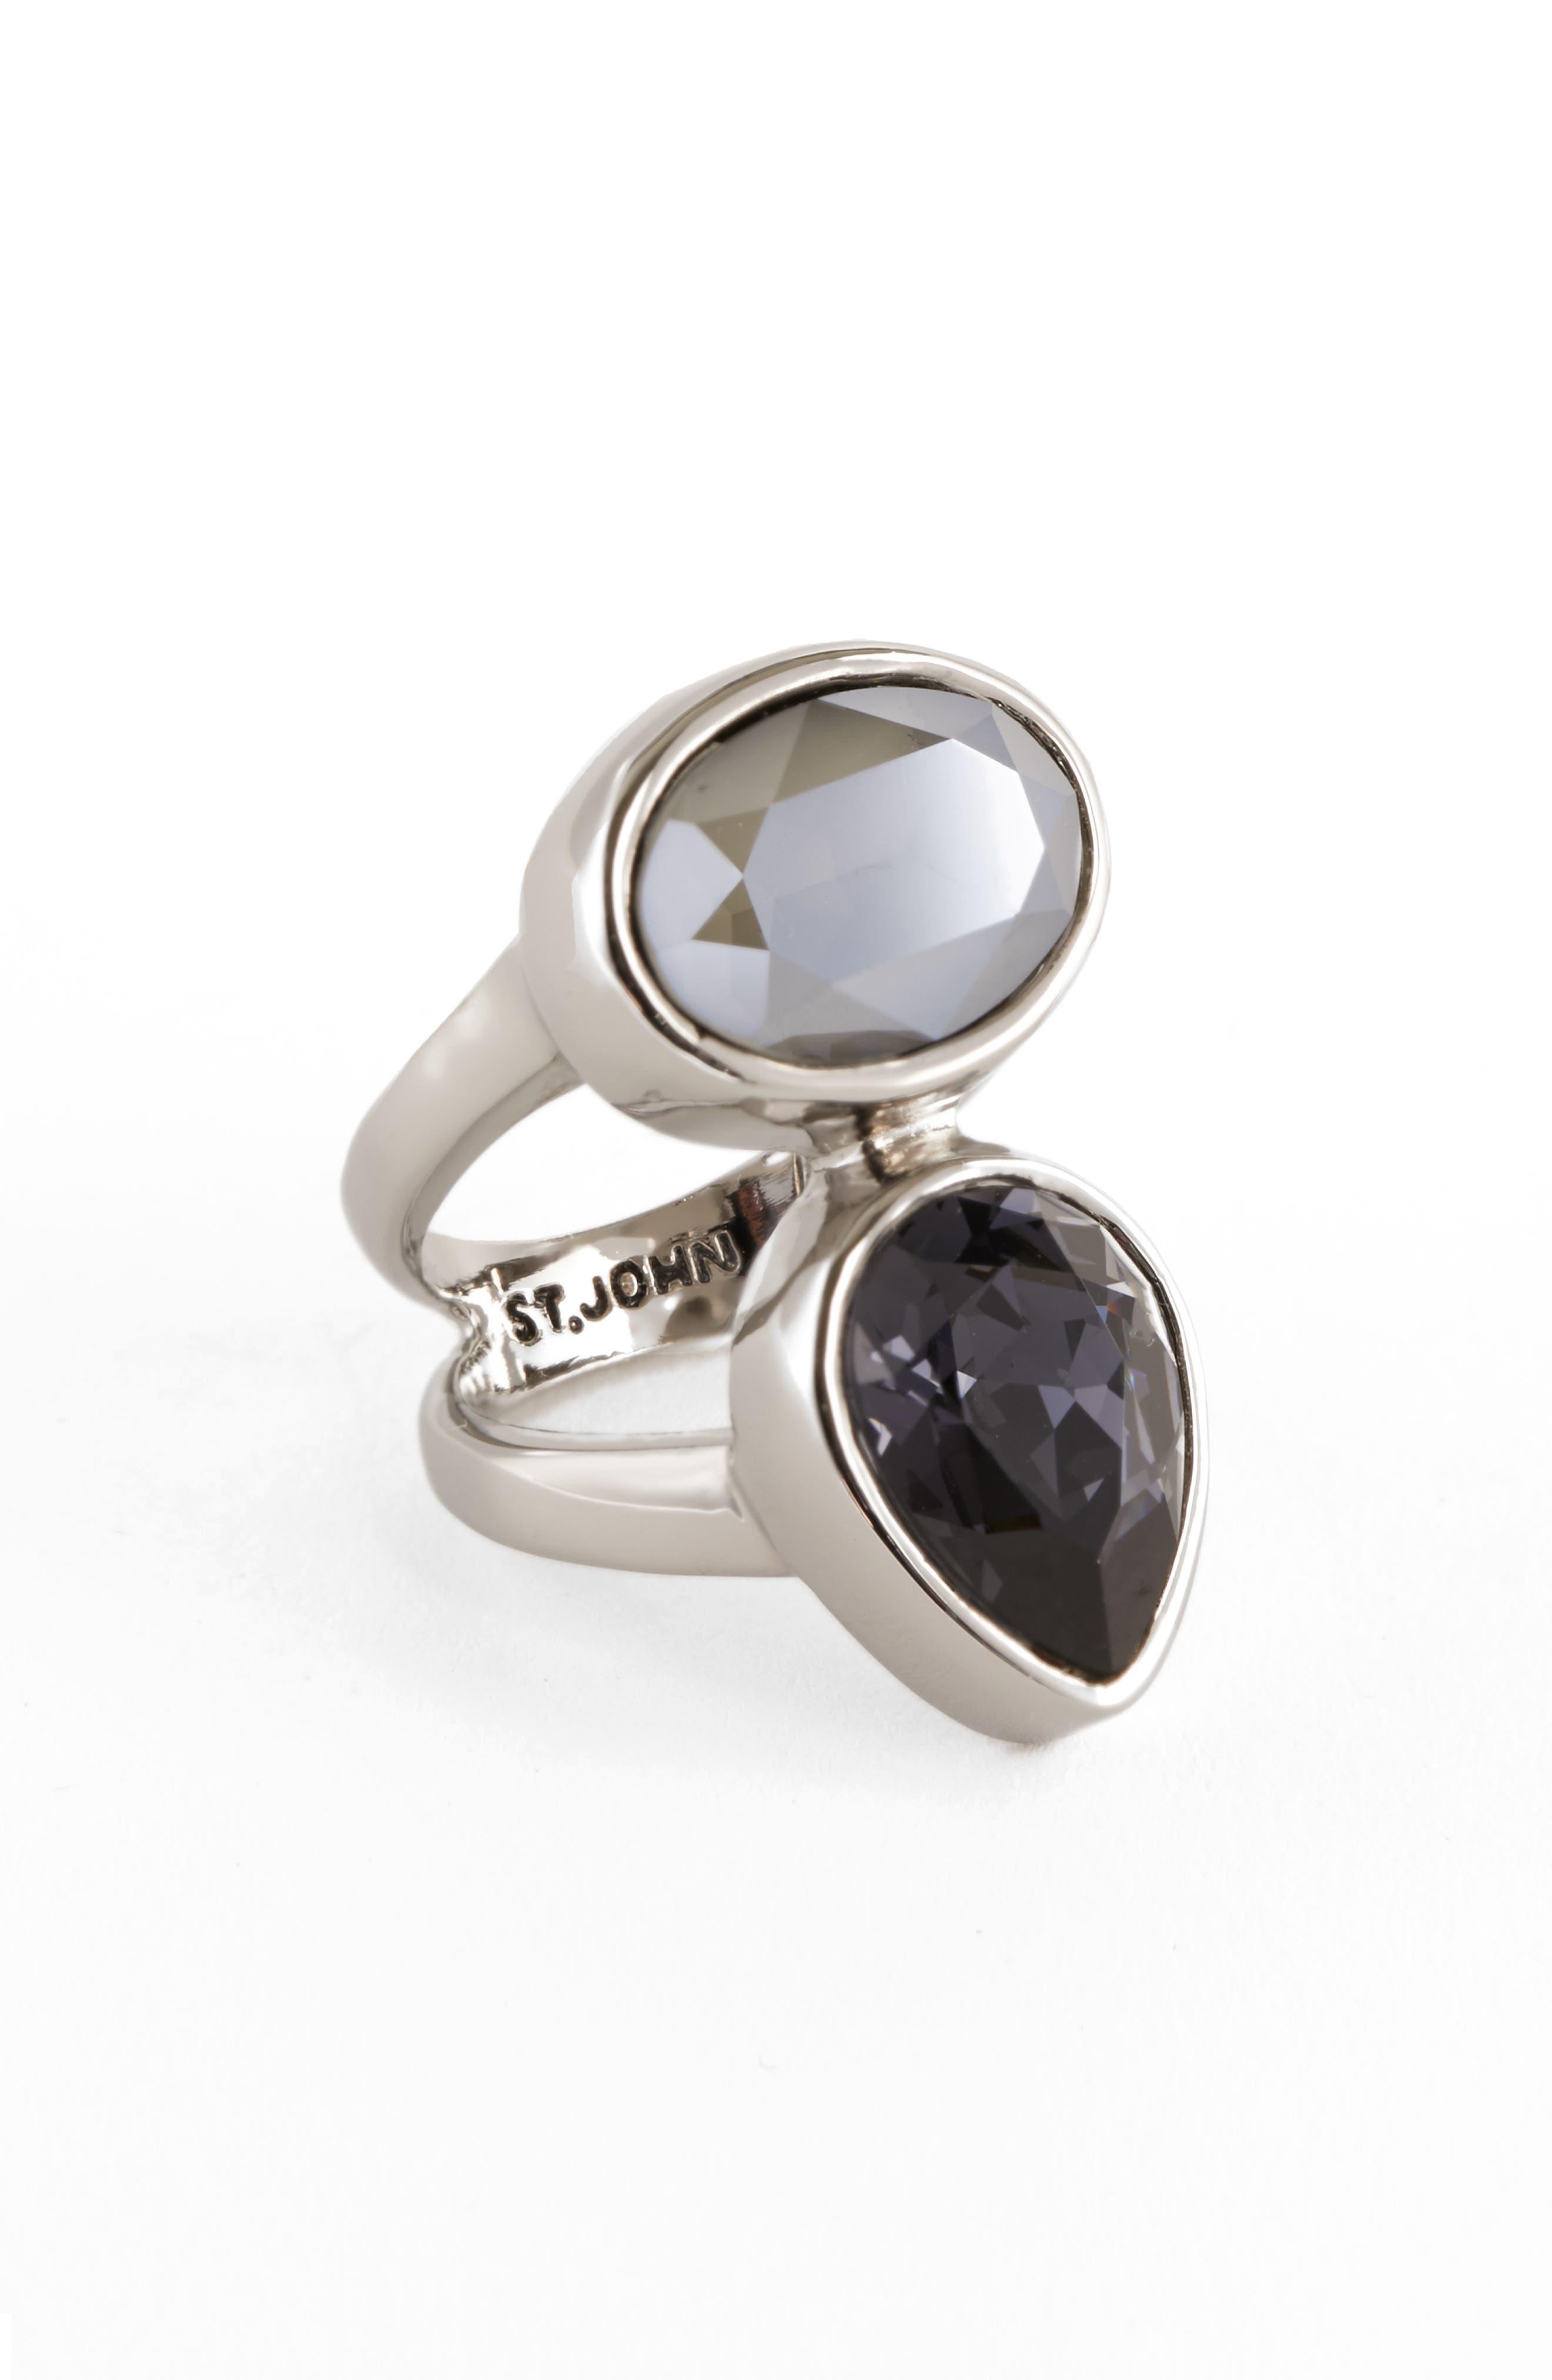 St. John Collection Swarovski Crystal Ring